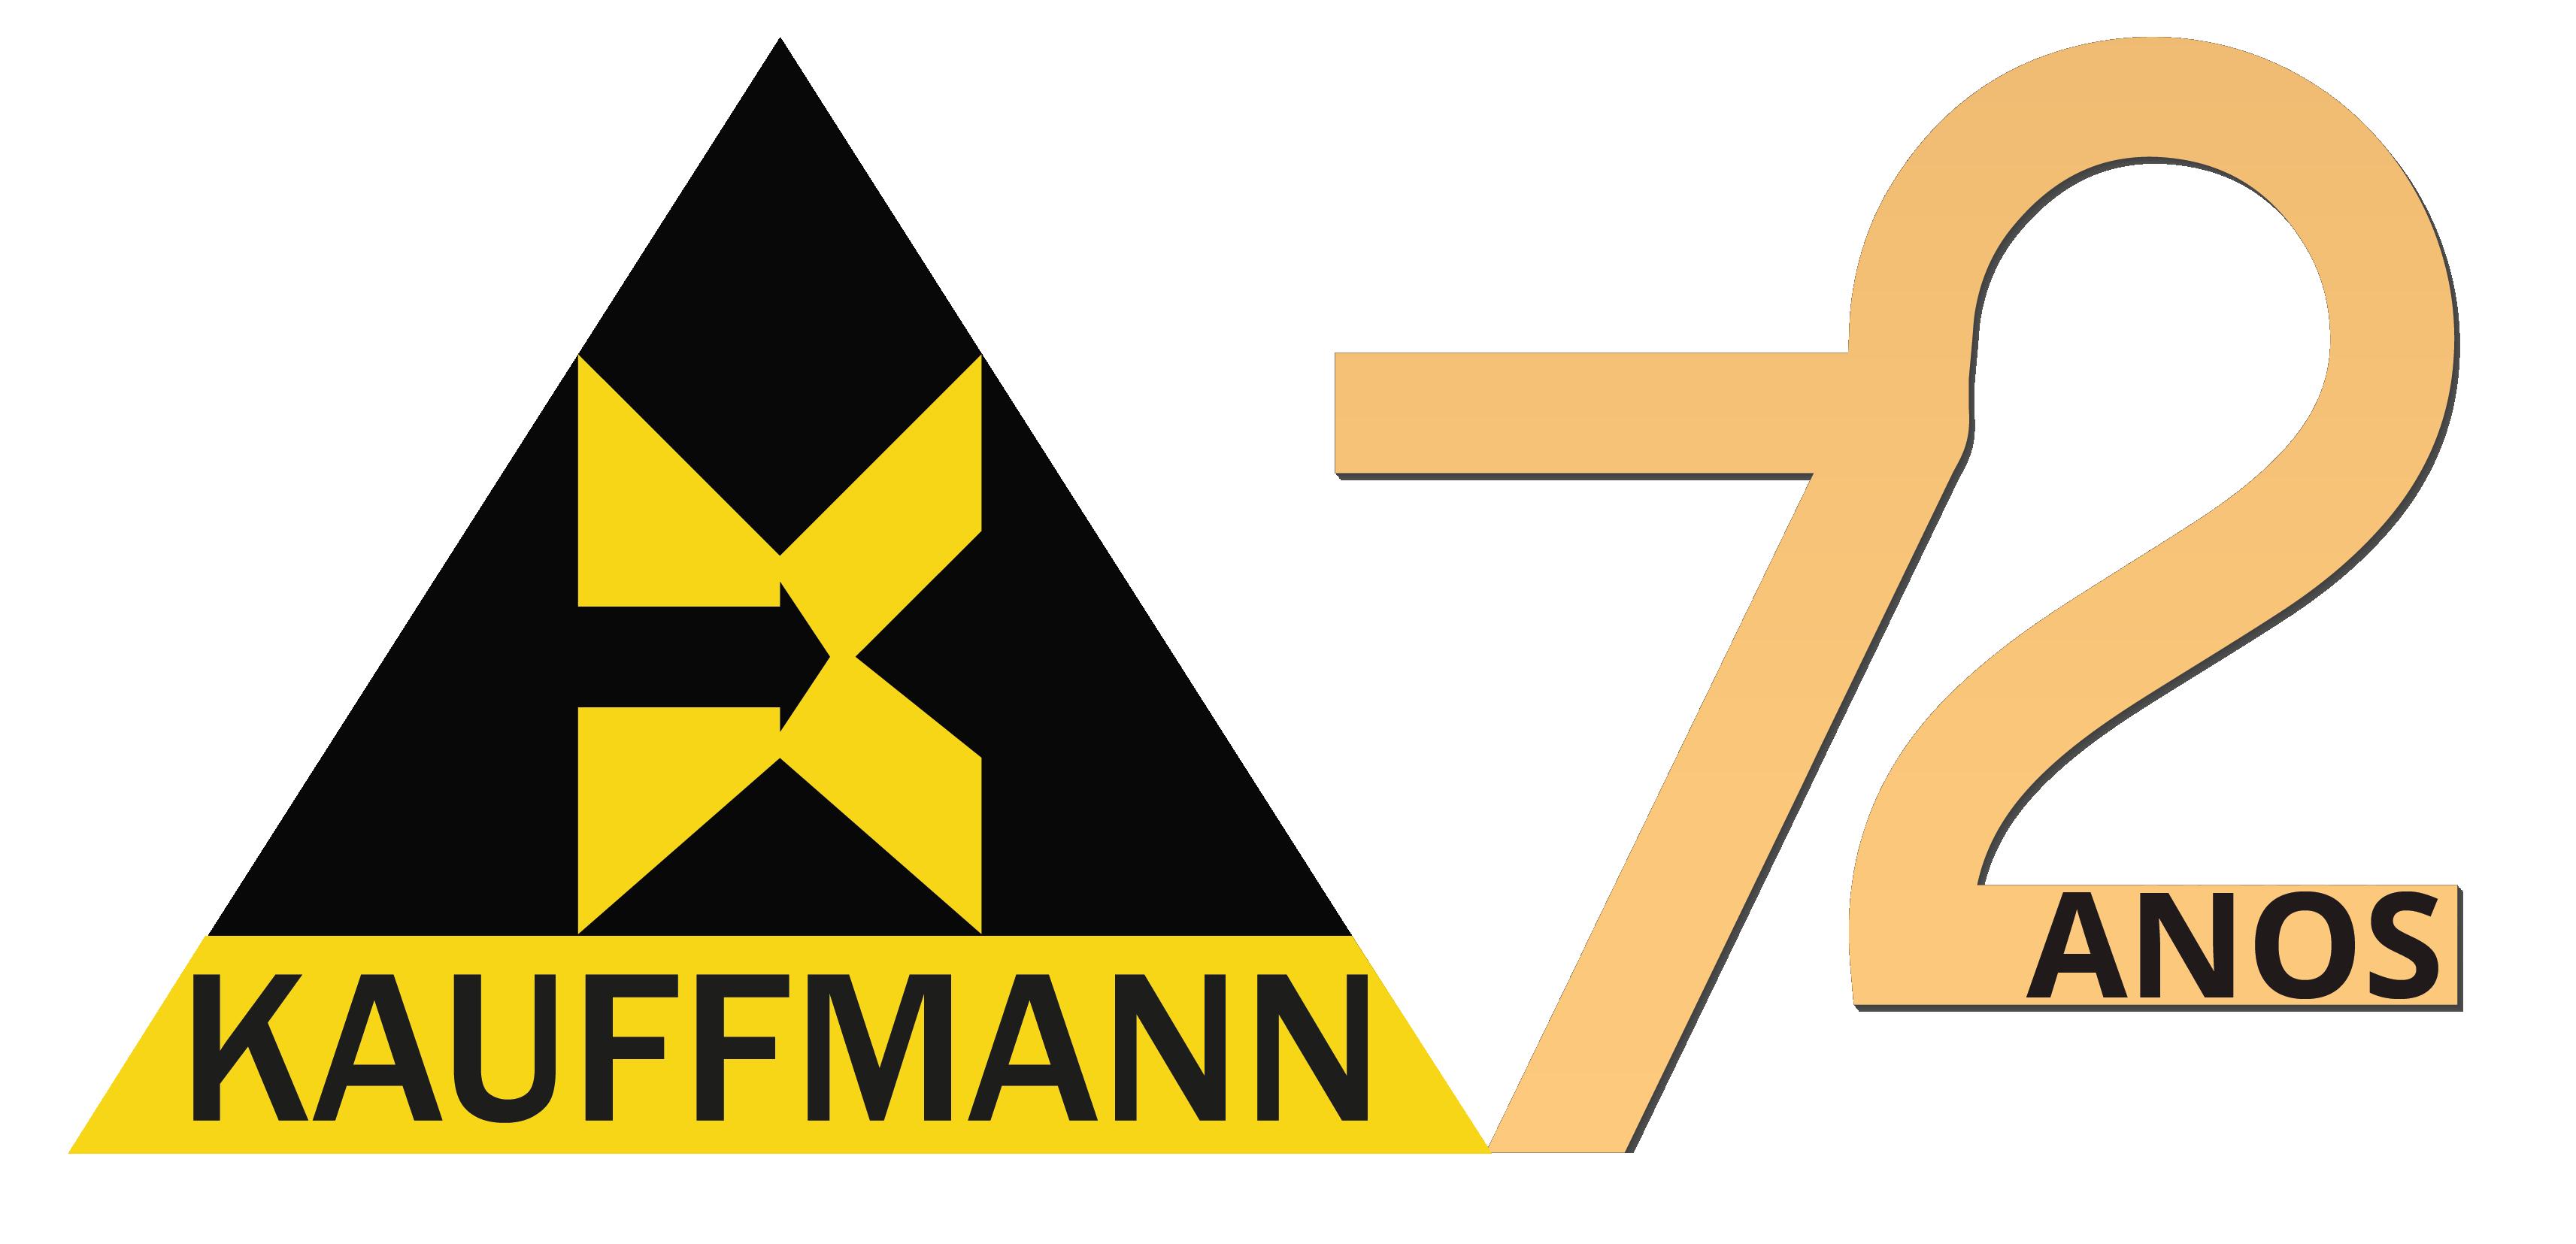 (c) Kauffmann.com.br